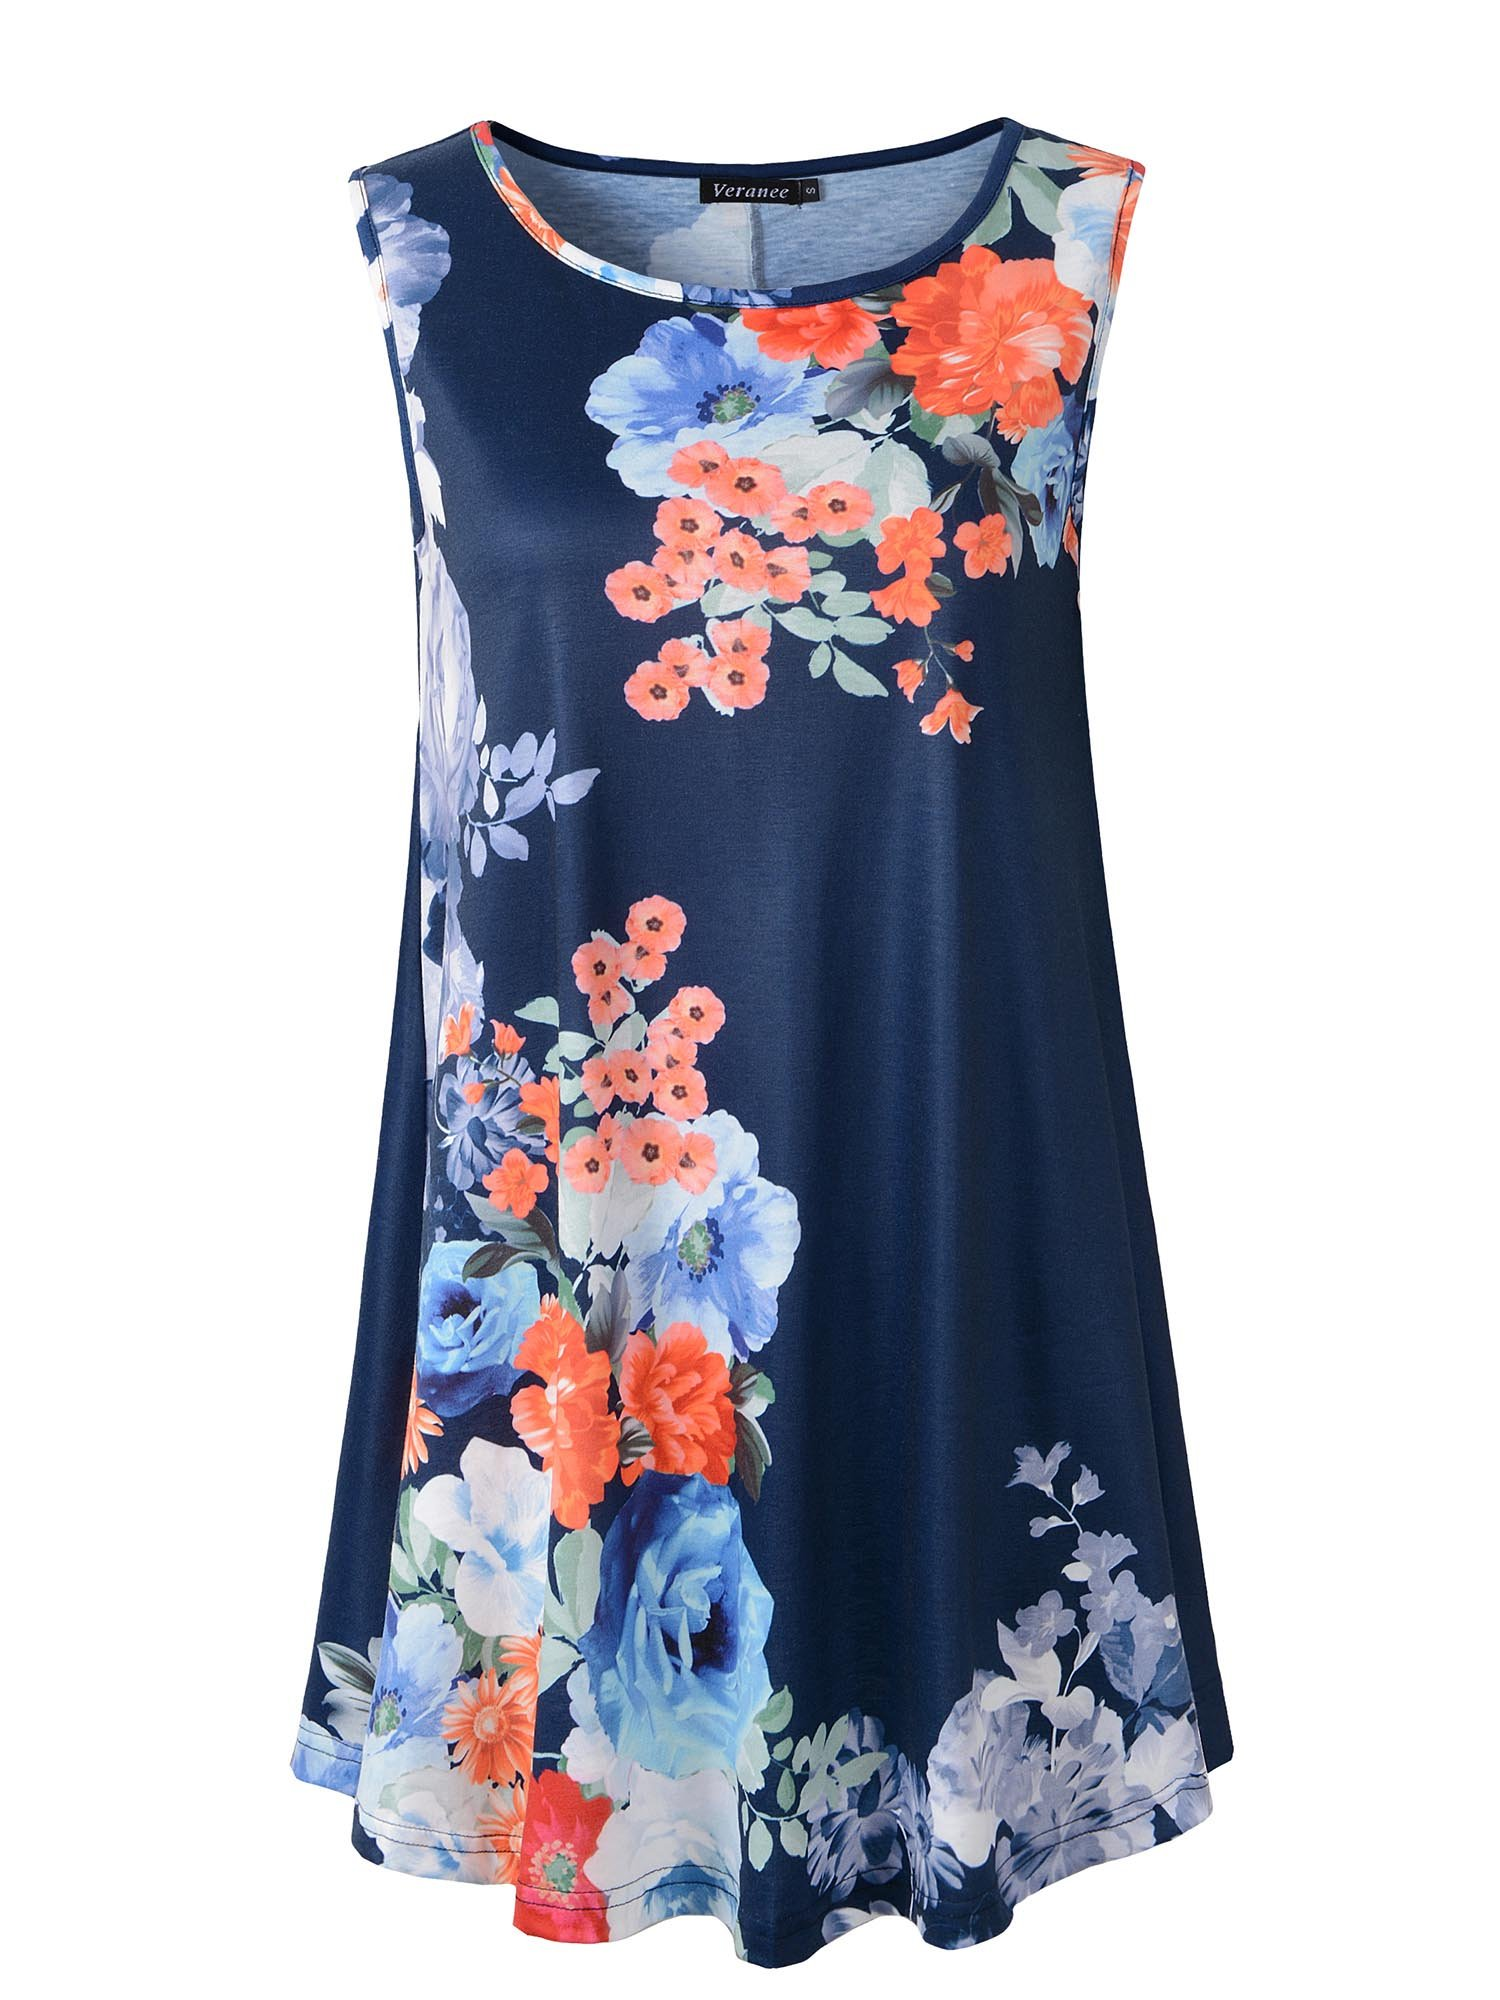 Veranee Women's Sleeveless Swing Tunic Summer Floral Flare Tank Top (X-Large, 6-9)